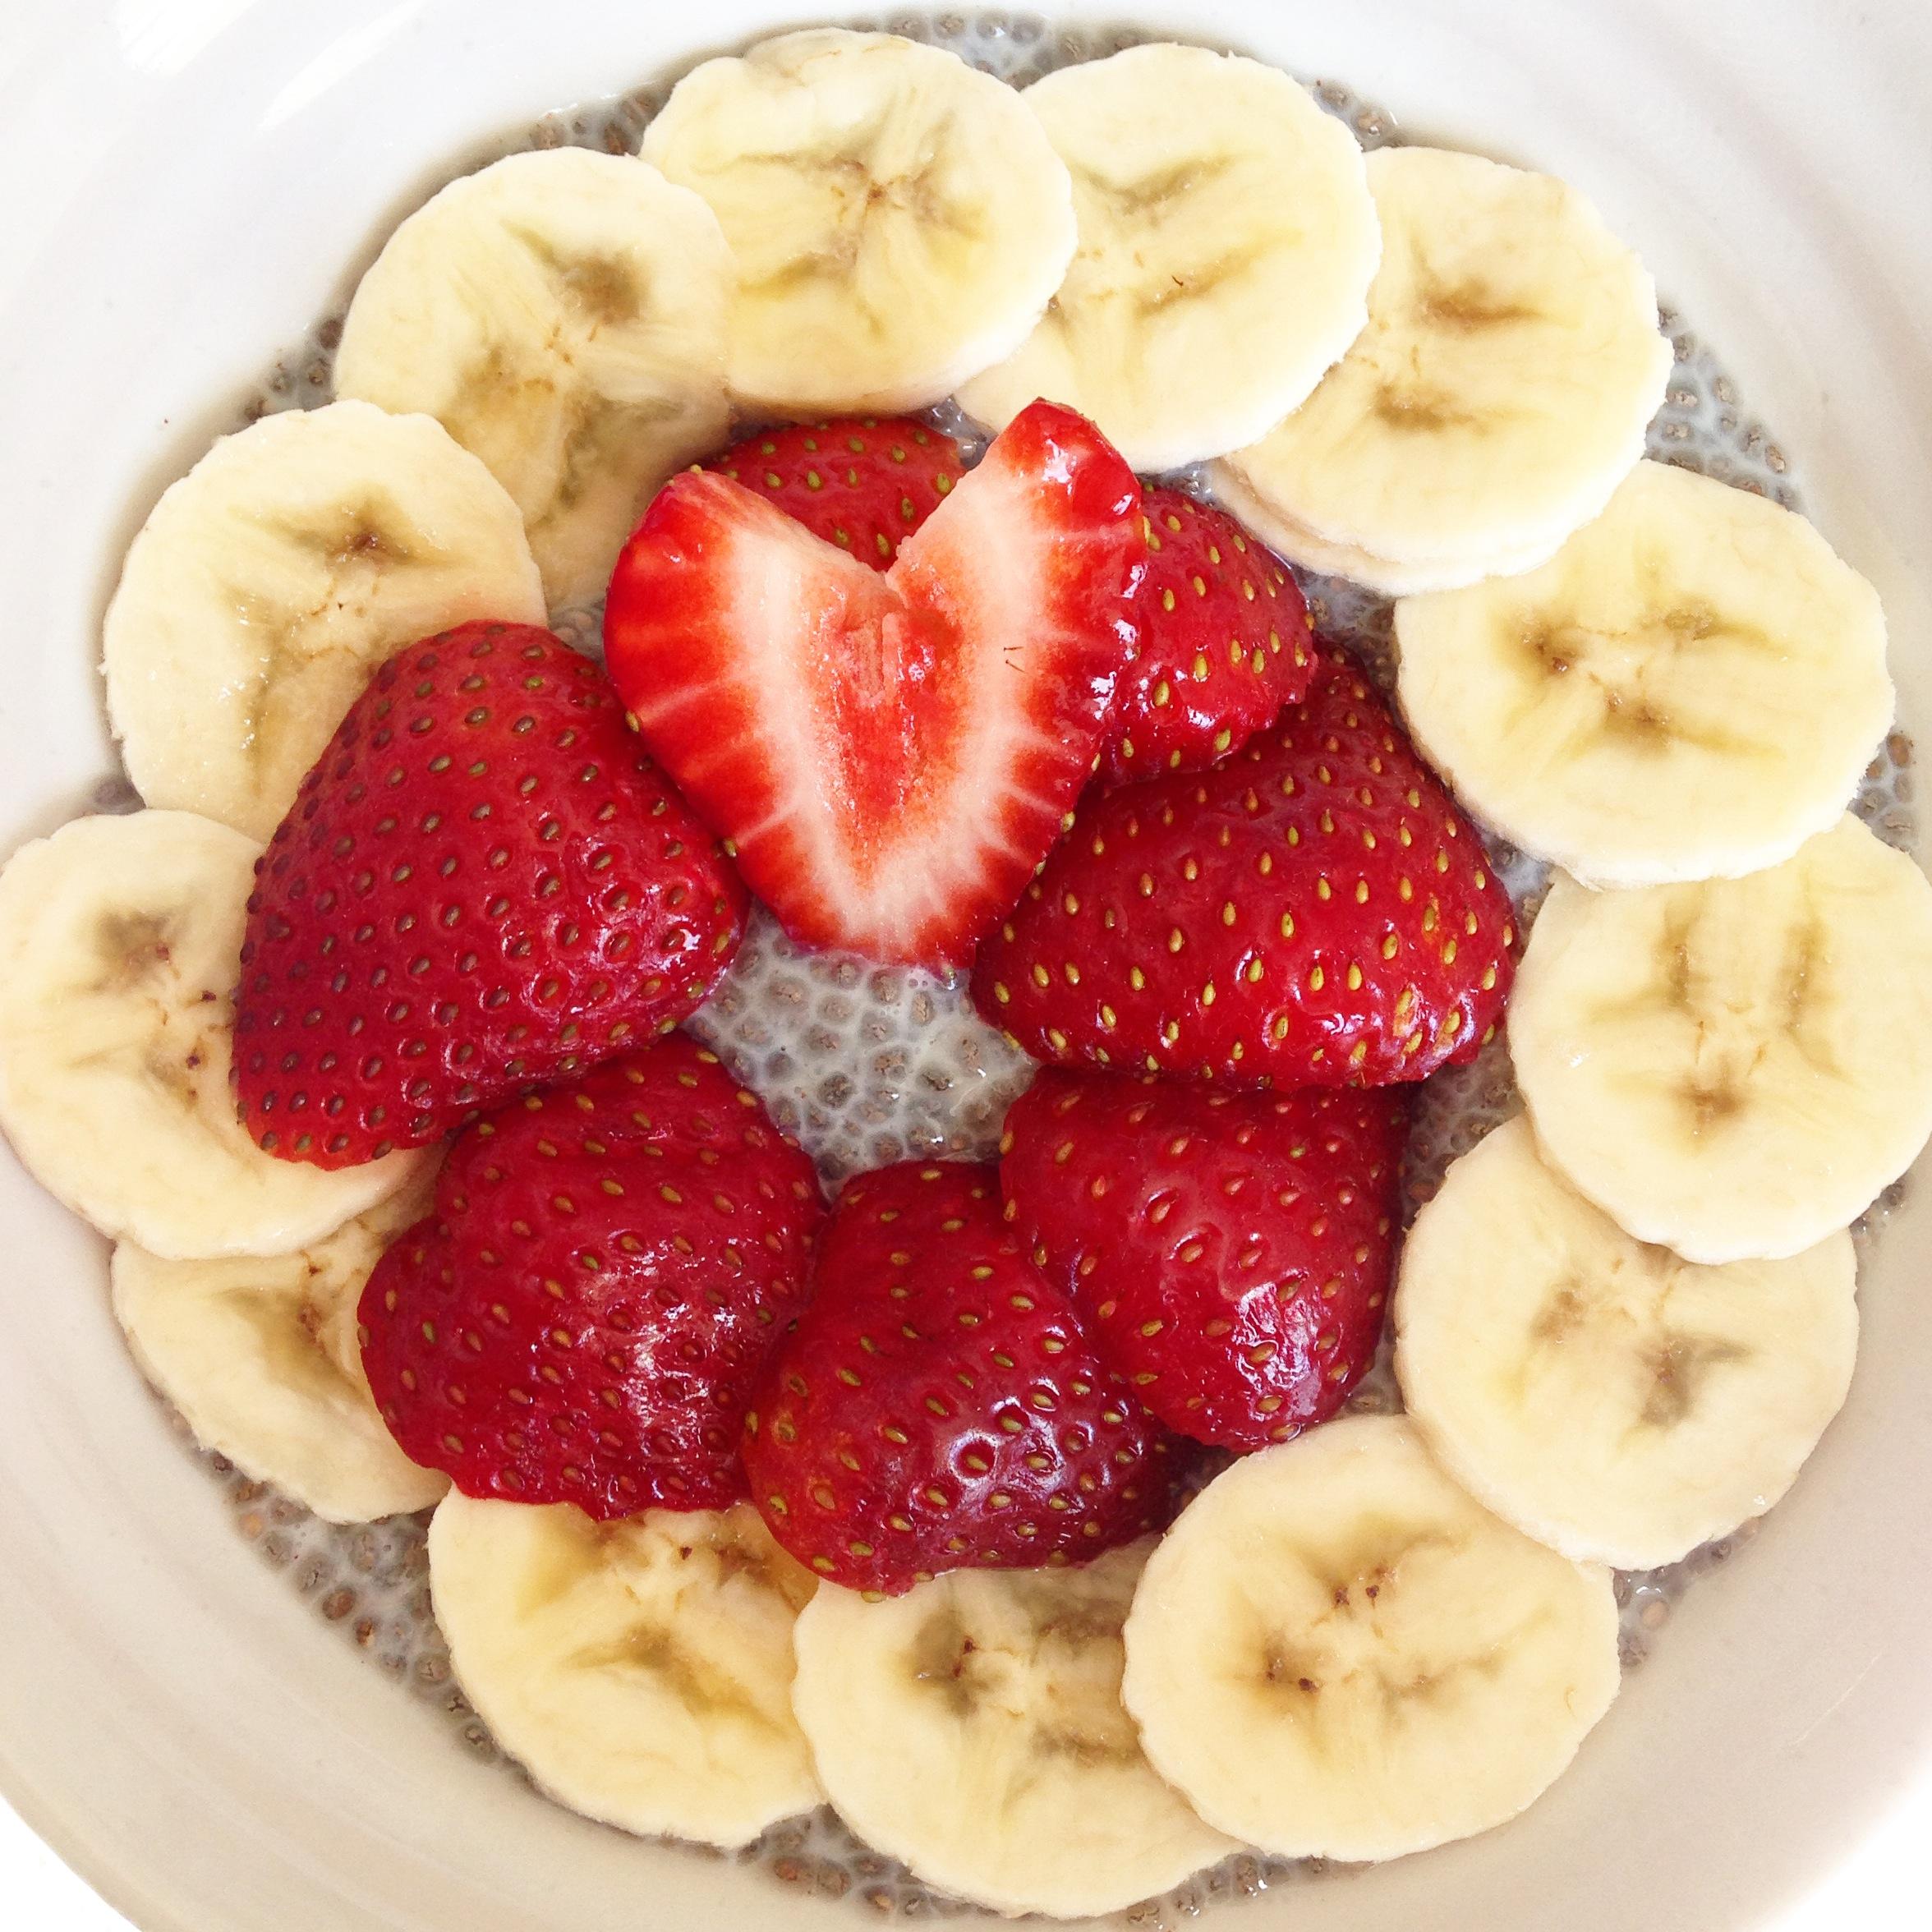 Strawberry and banana chia pudding.